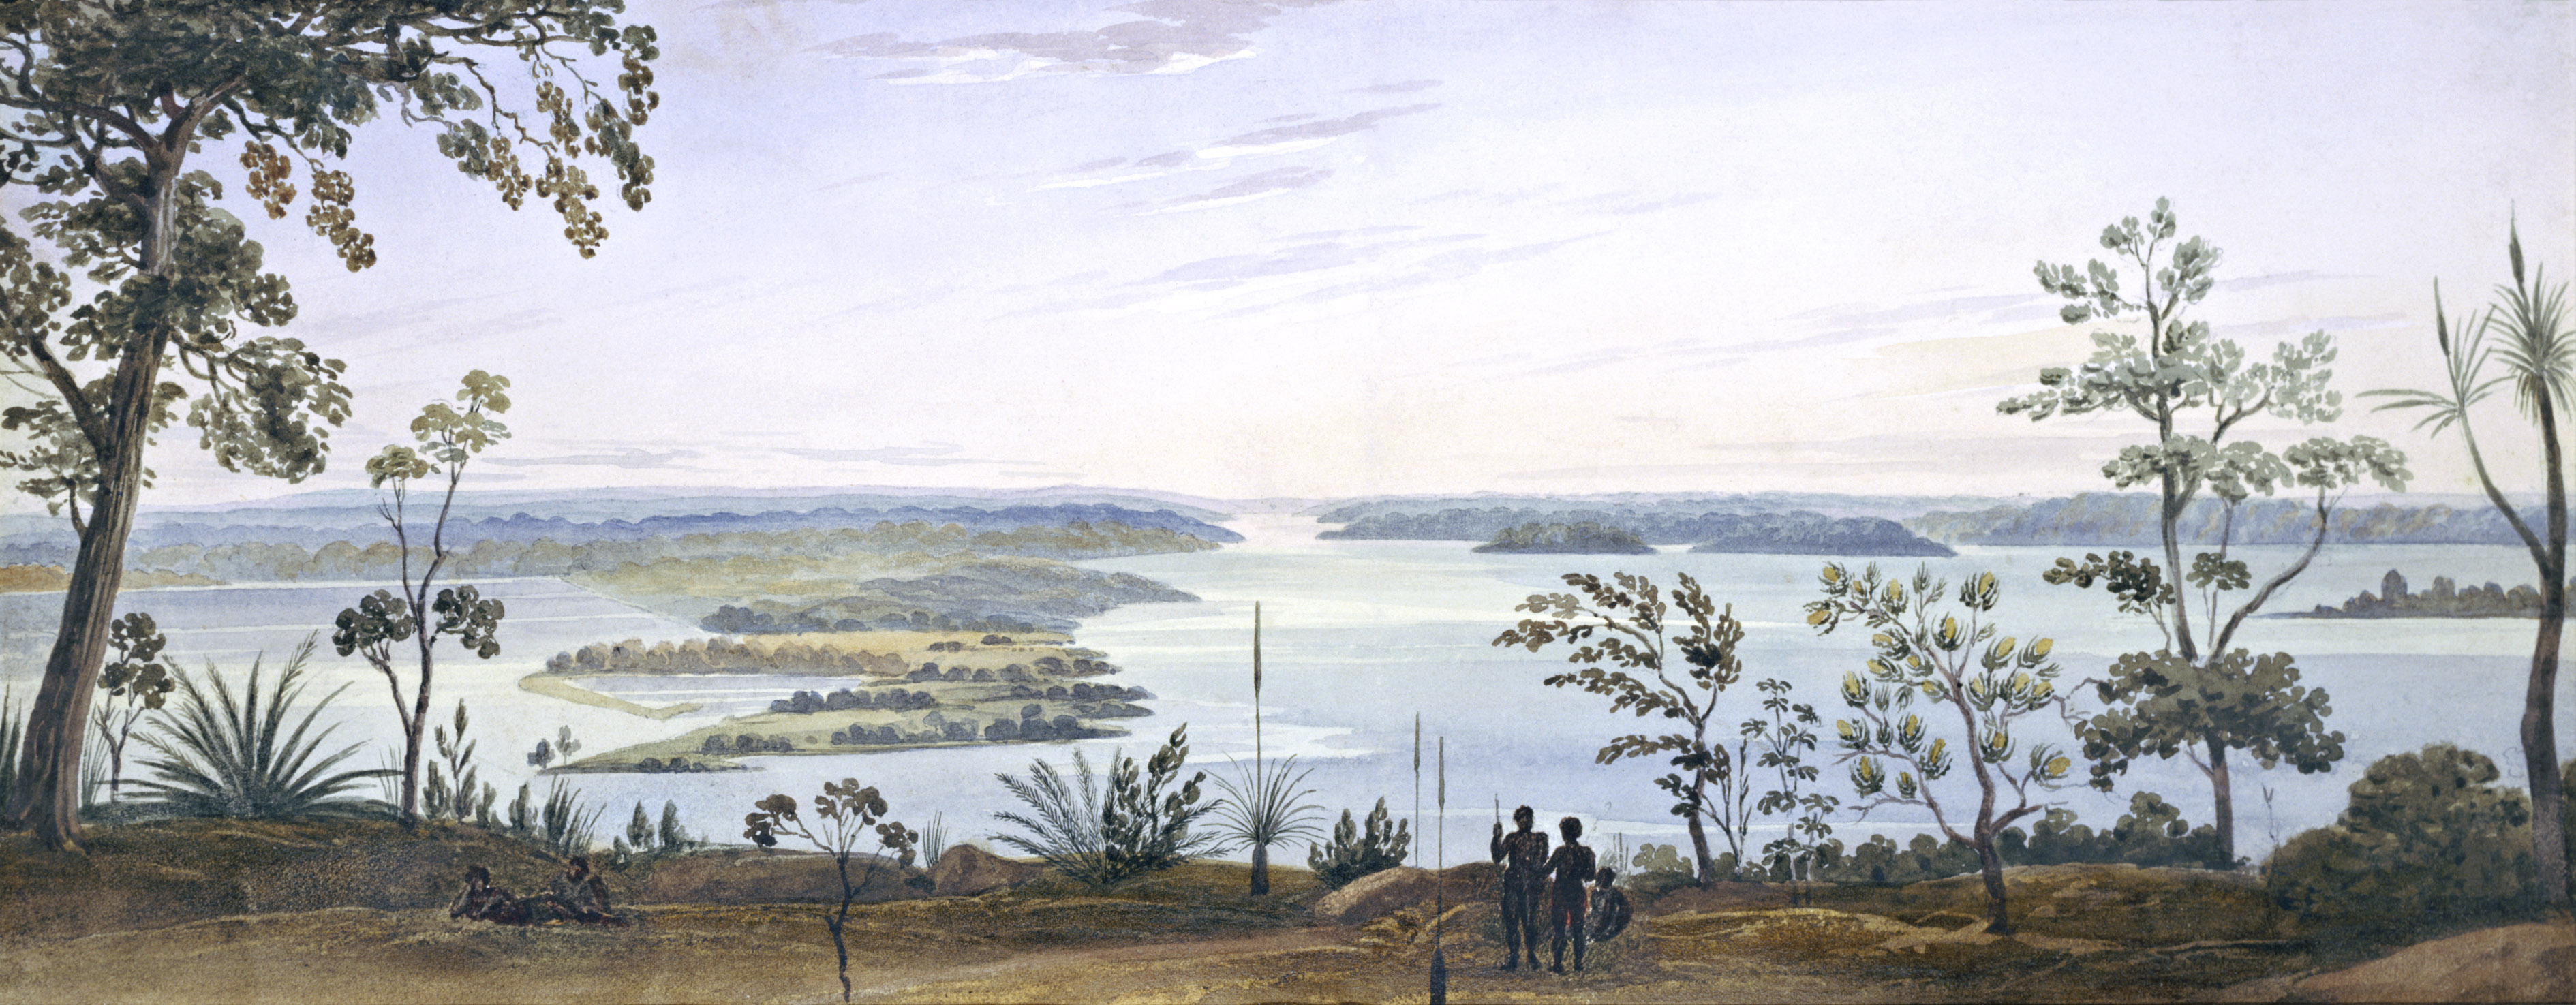 Before Perth S Aboriginal History